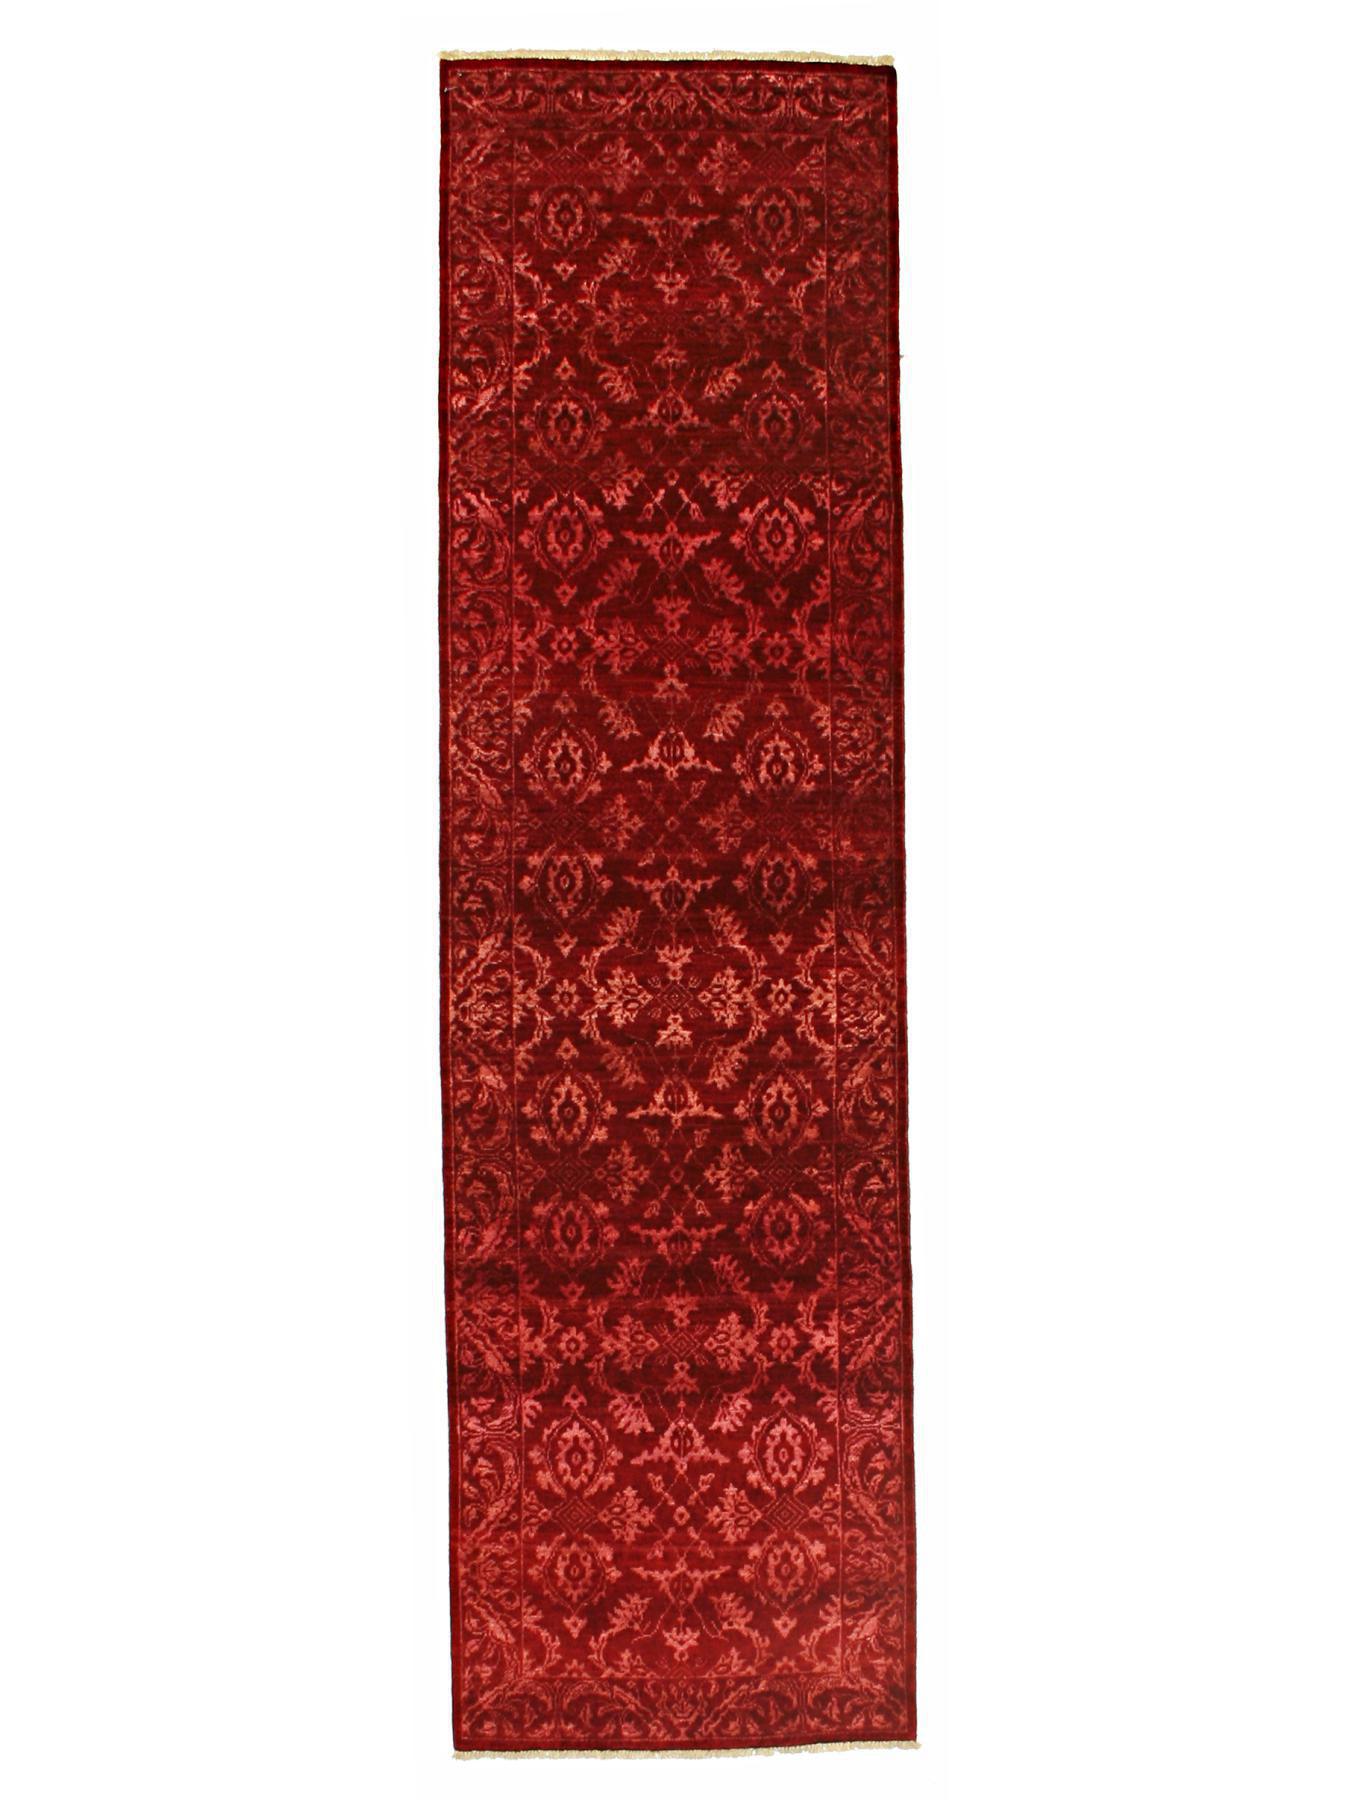 Luxury carpets - Damask-AL-1 F-43/B-9 Outlet